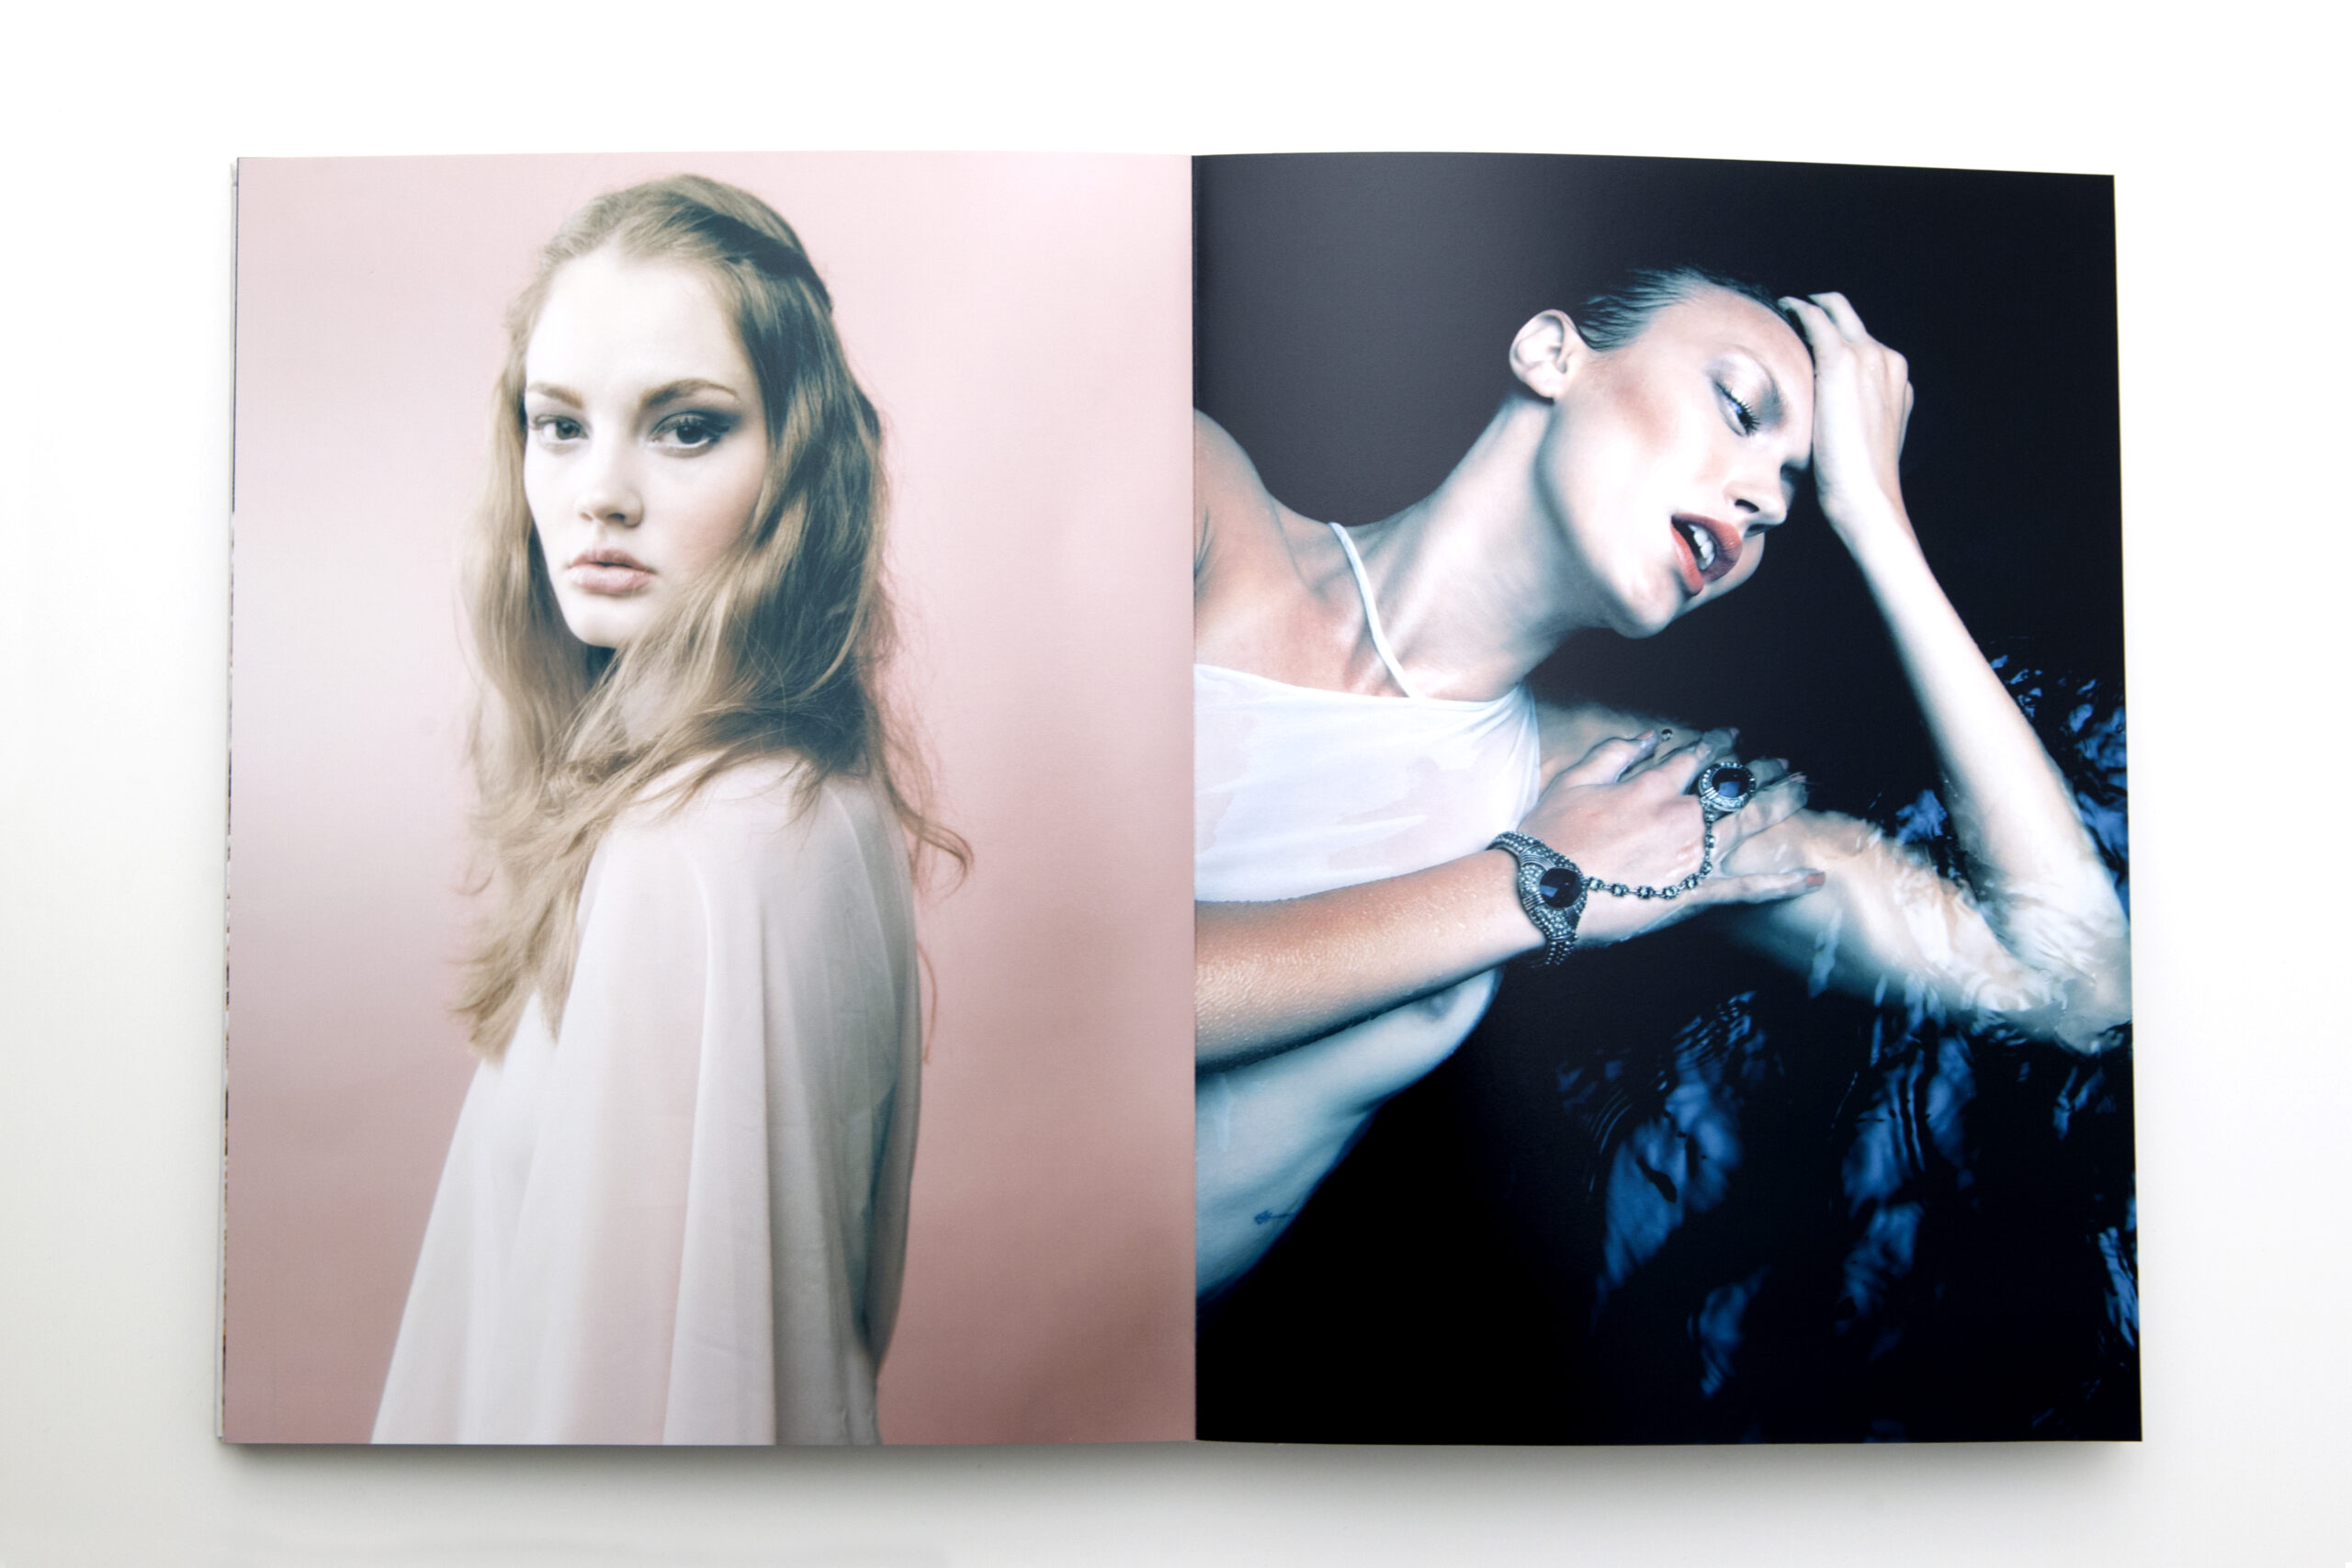 Print Edit: A Fashionable Look for Sean Scheidt